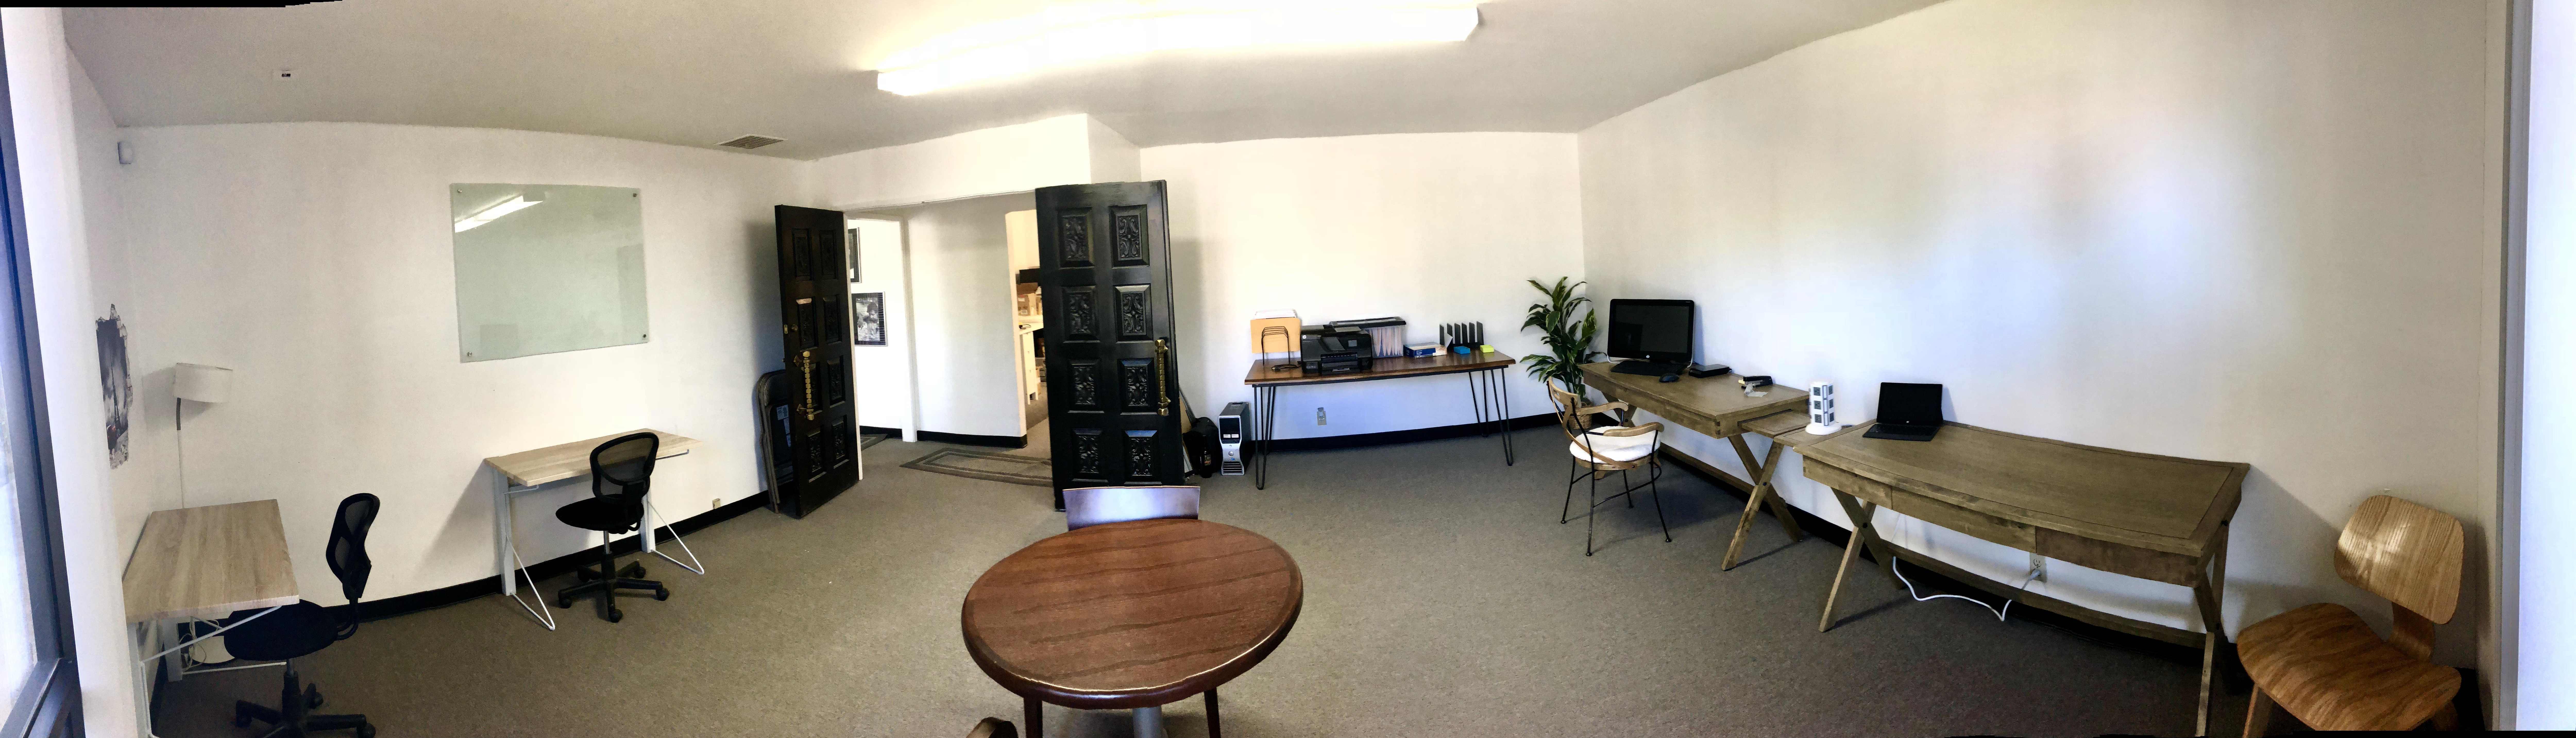 Edward Office Space - Edward Ave - Team Office